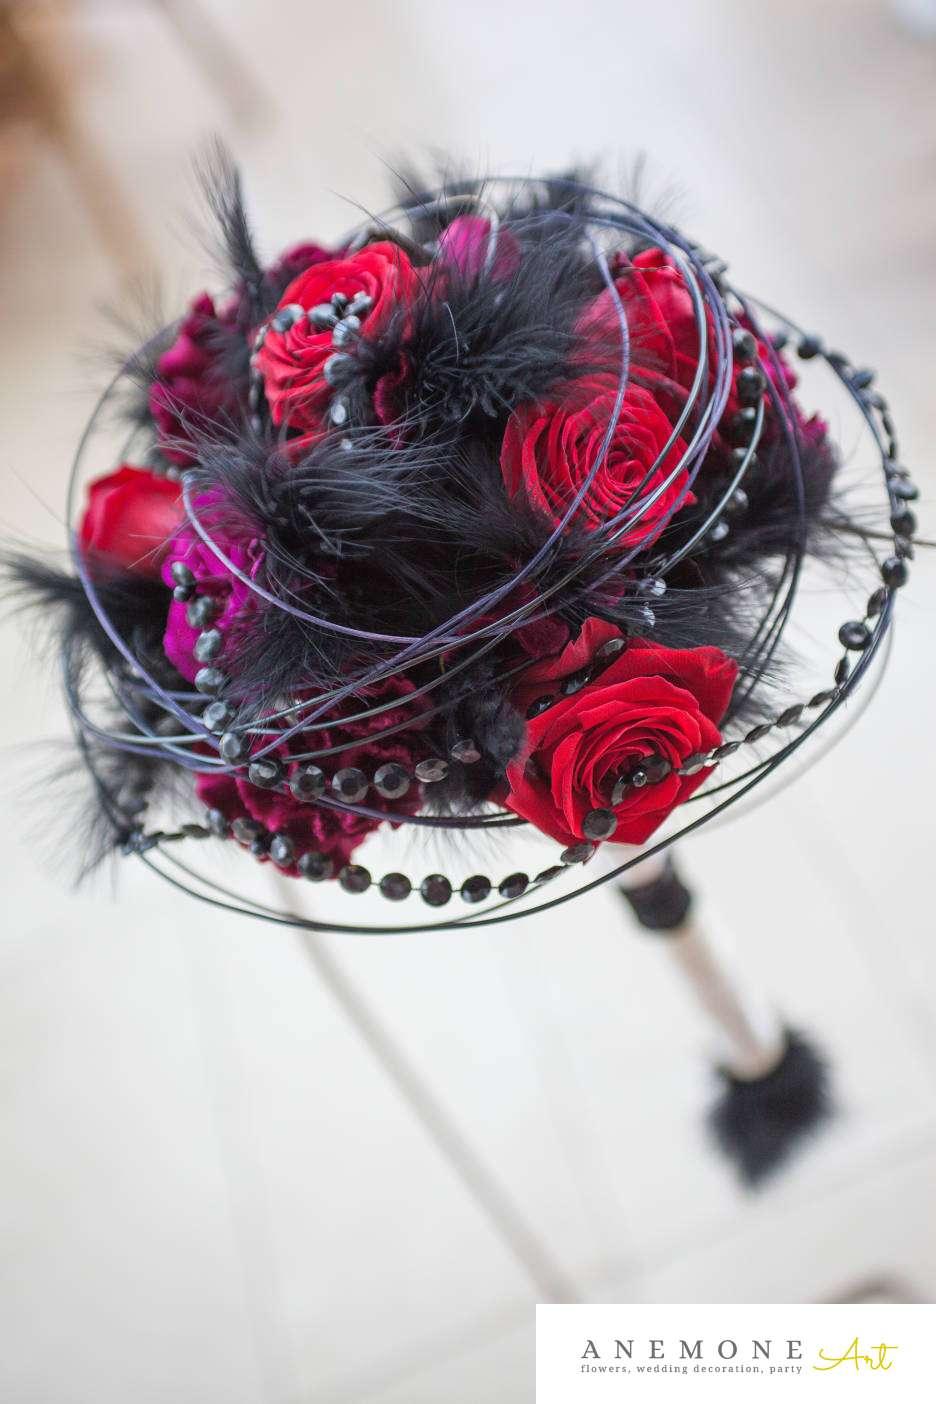 Poza, foto cu Flori de nunta buchet mireasa, negru, pene, perle, rosu, rotund, visiniu in Arad, Timisoara, Oradea (wedding flowers, bouquets) nunta Arad, Timisoara, Oradea